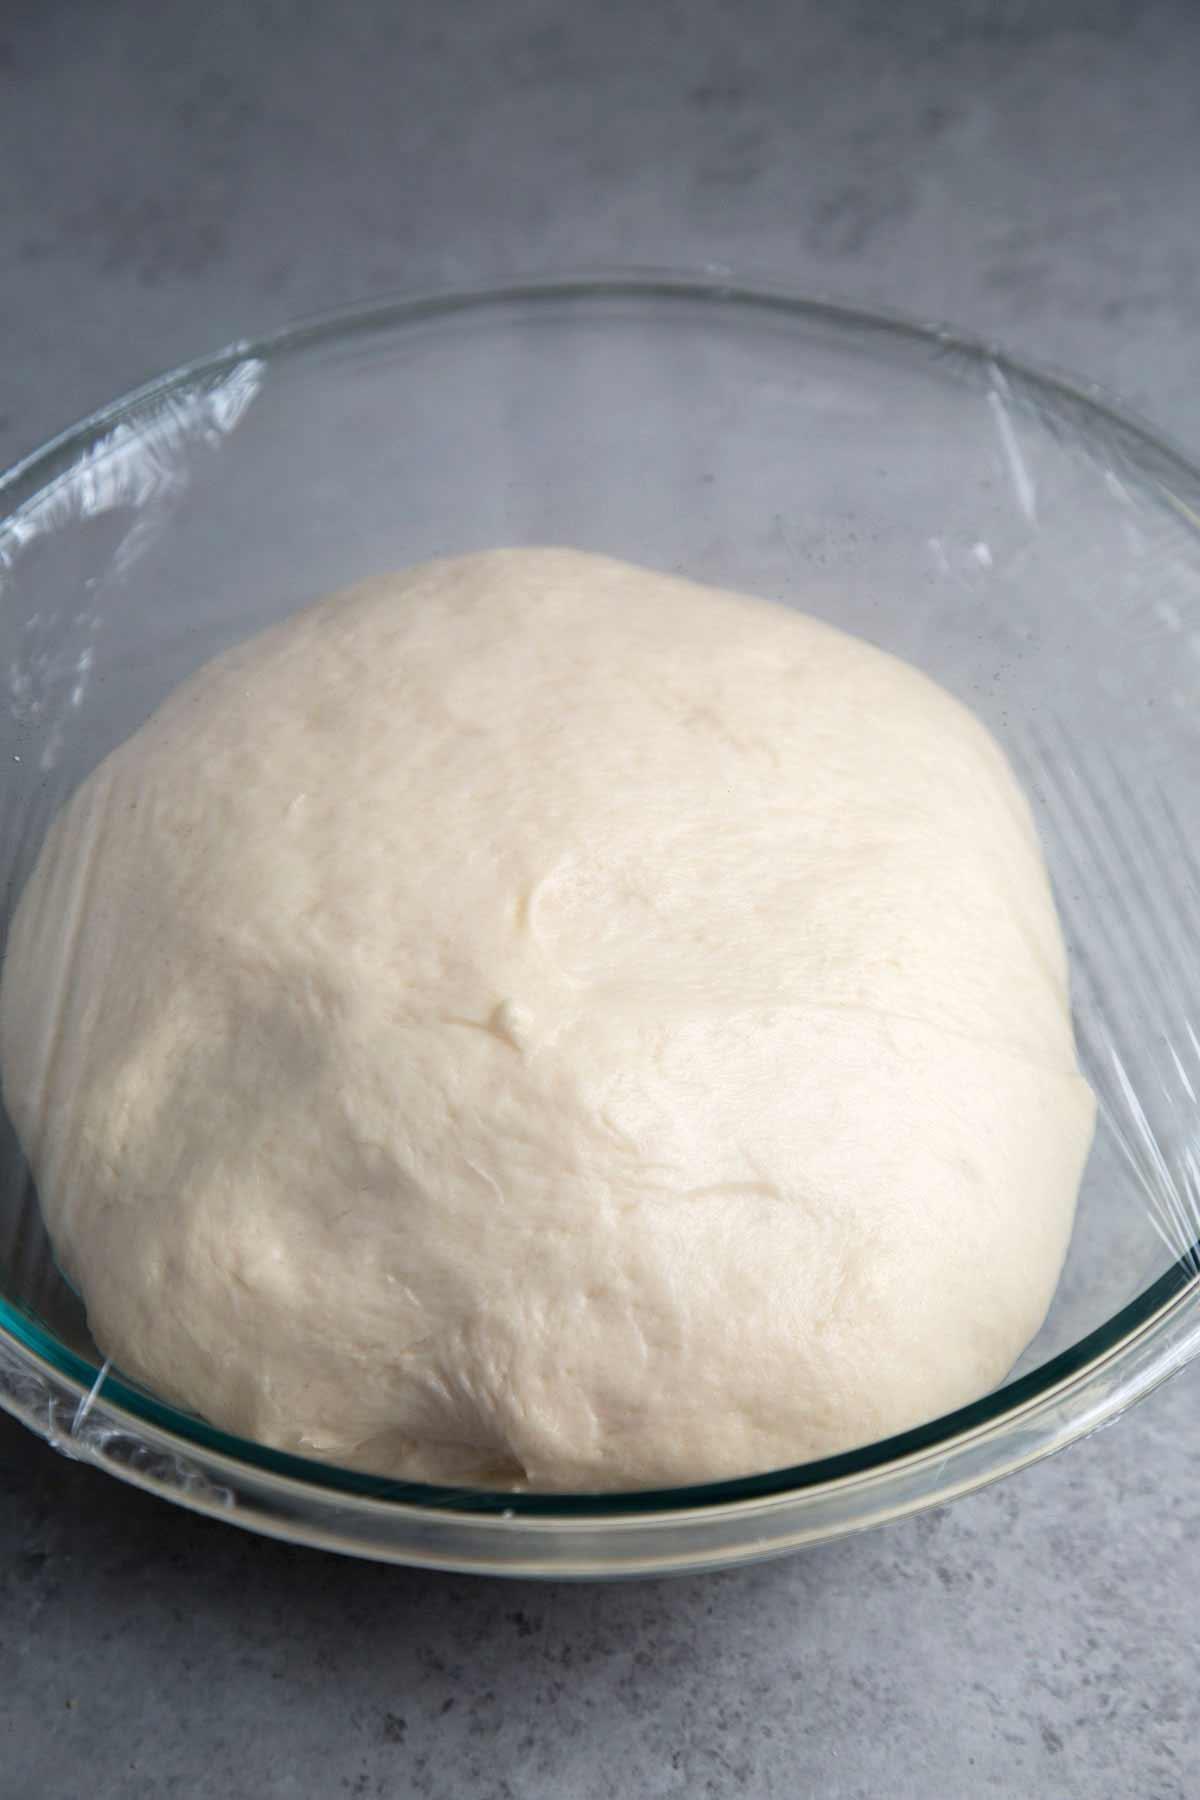 Milk Bread Dough after proof